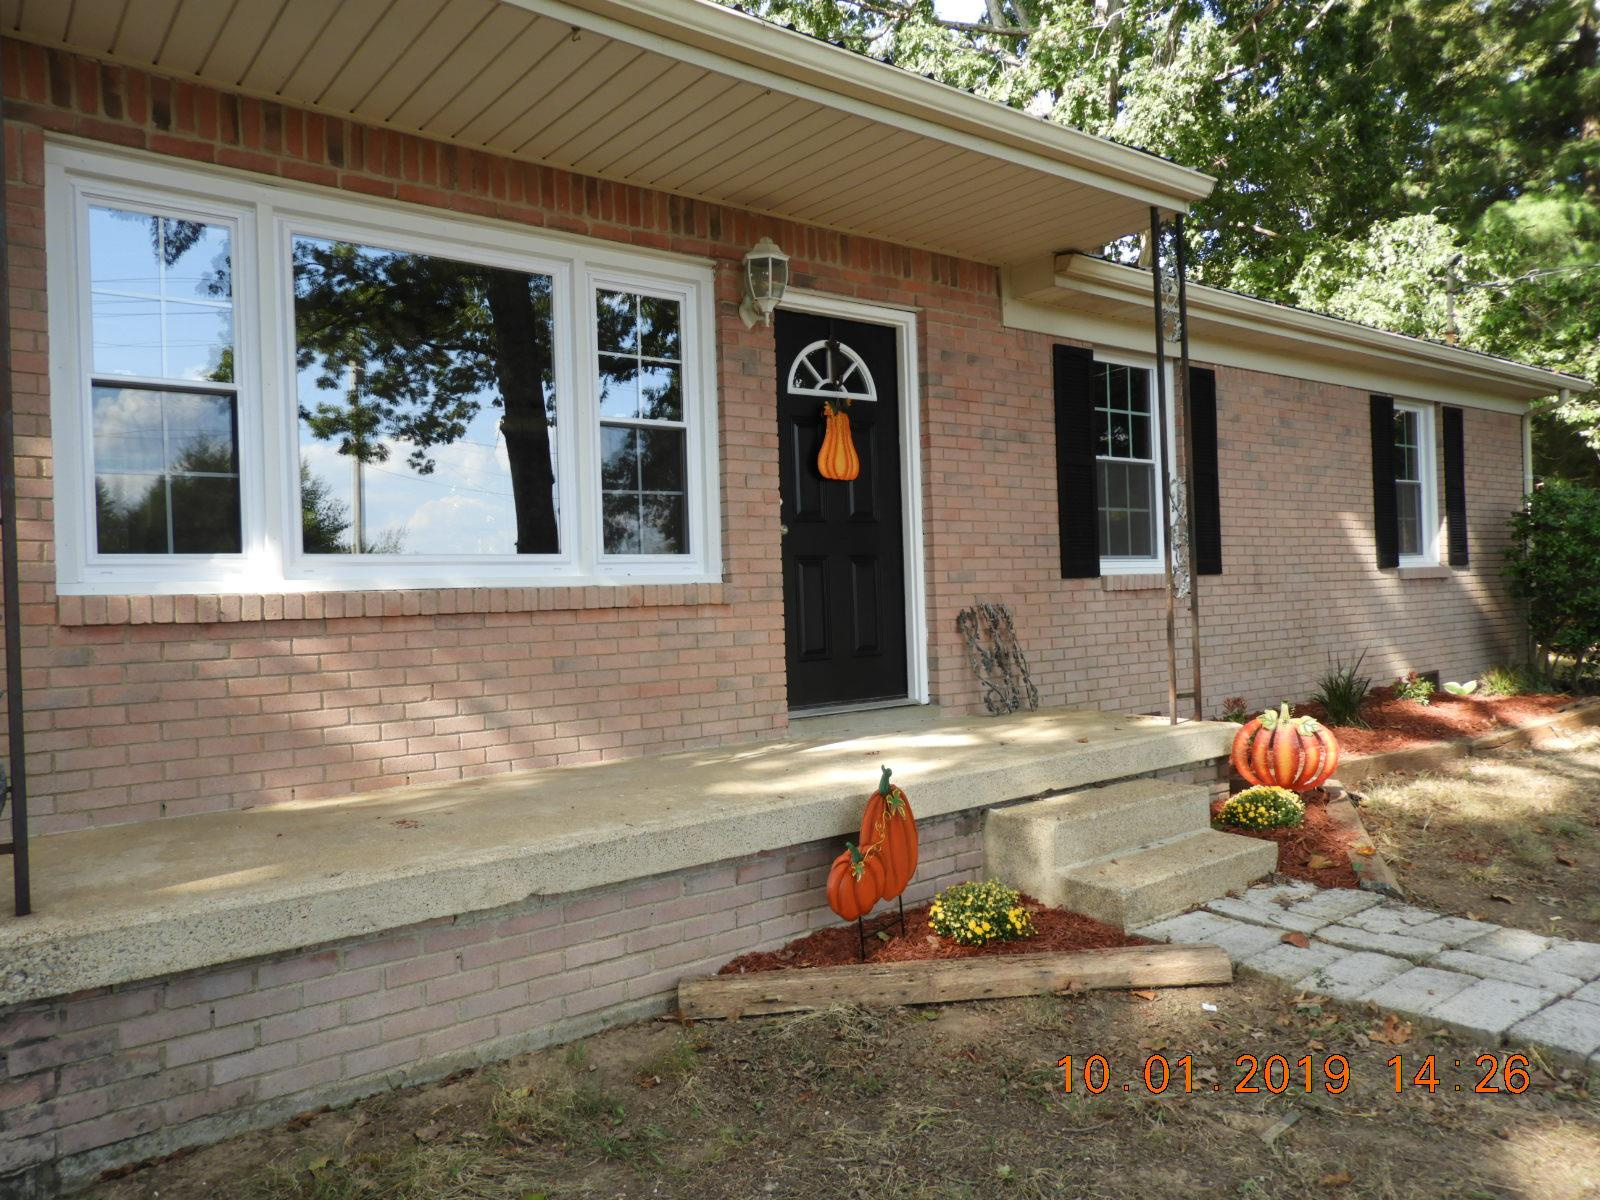 1110 Fall River Rd, Goodspring, TN 38460 - Goodspring, TN real estate listing